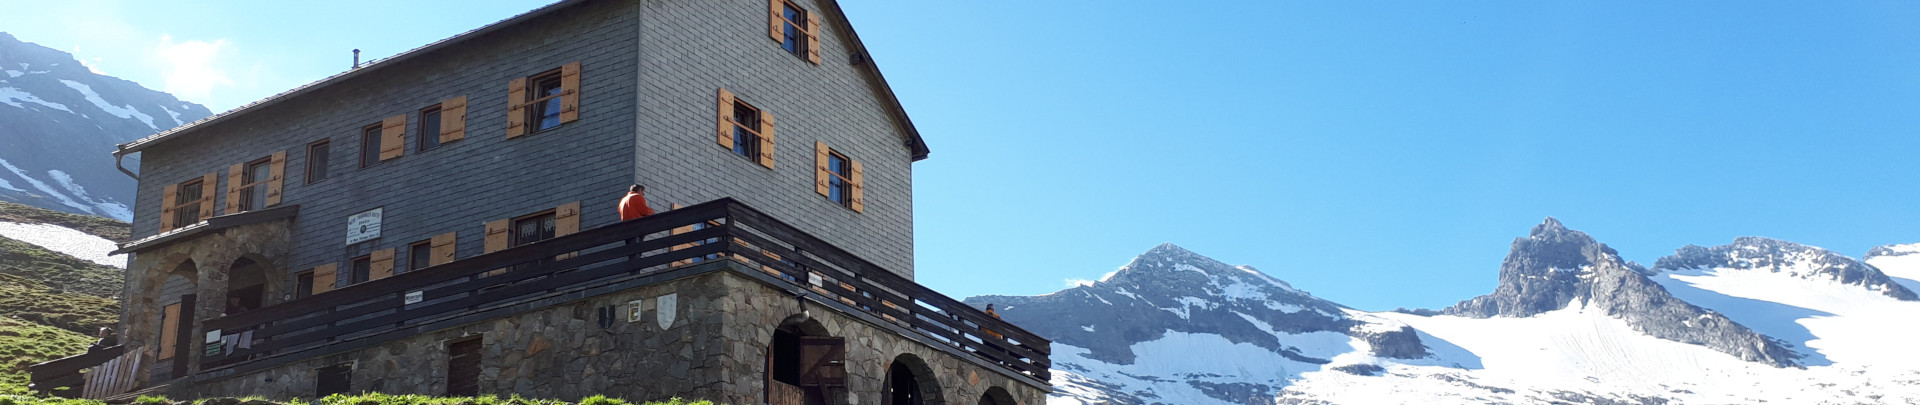 Neue Thüringer Hütte / Habachtal